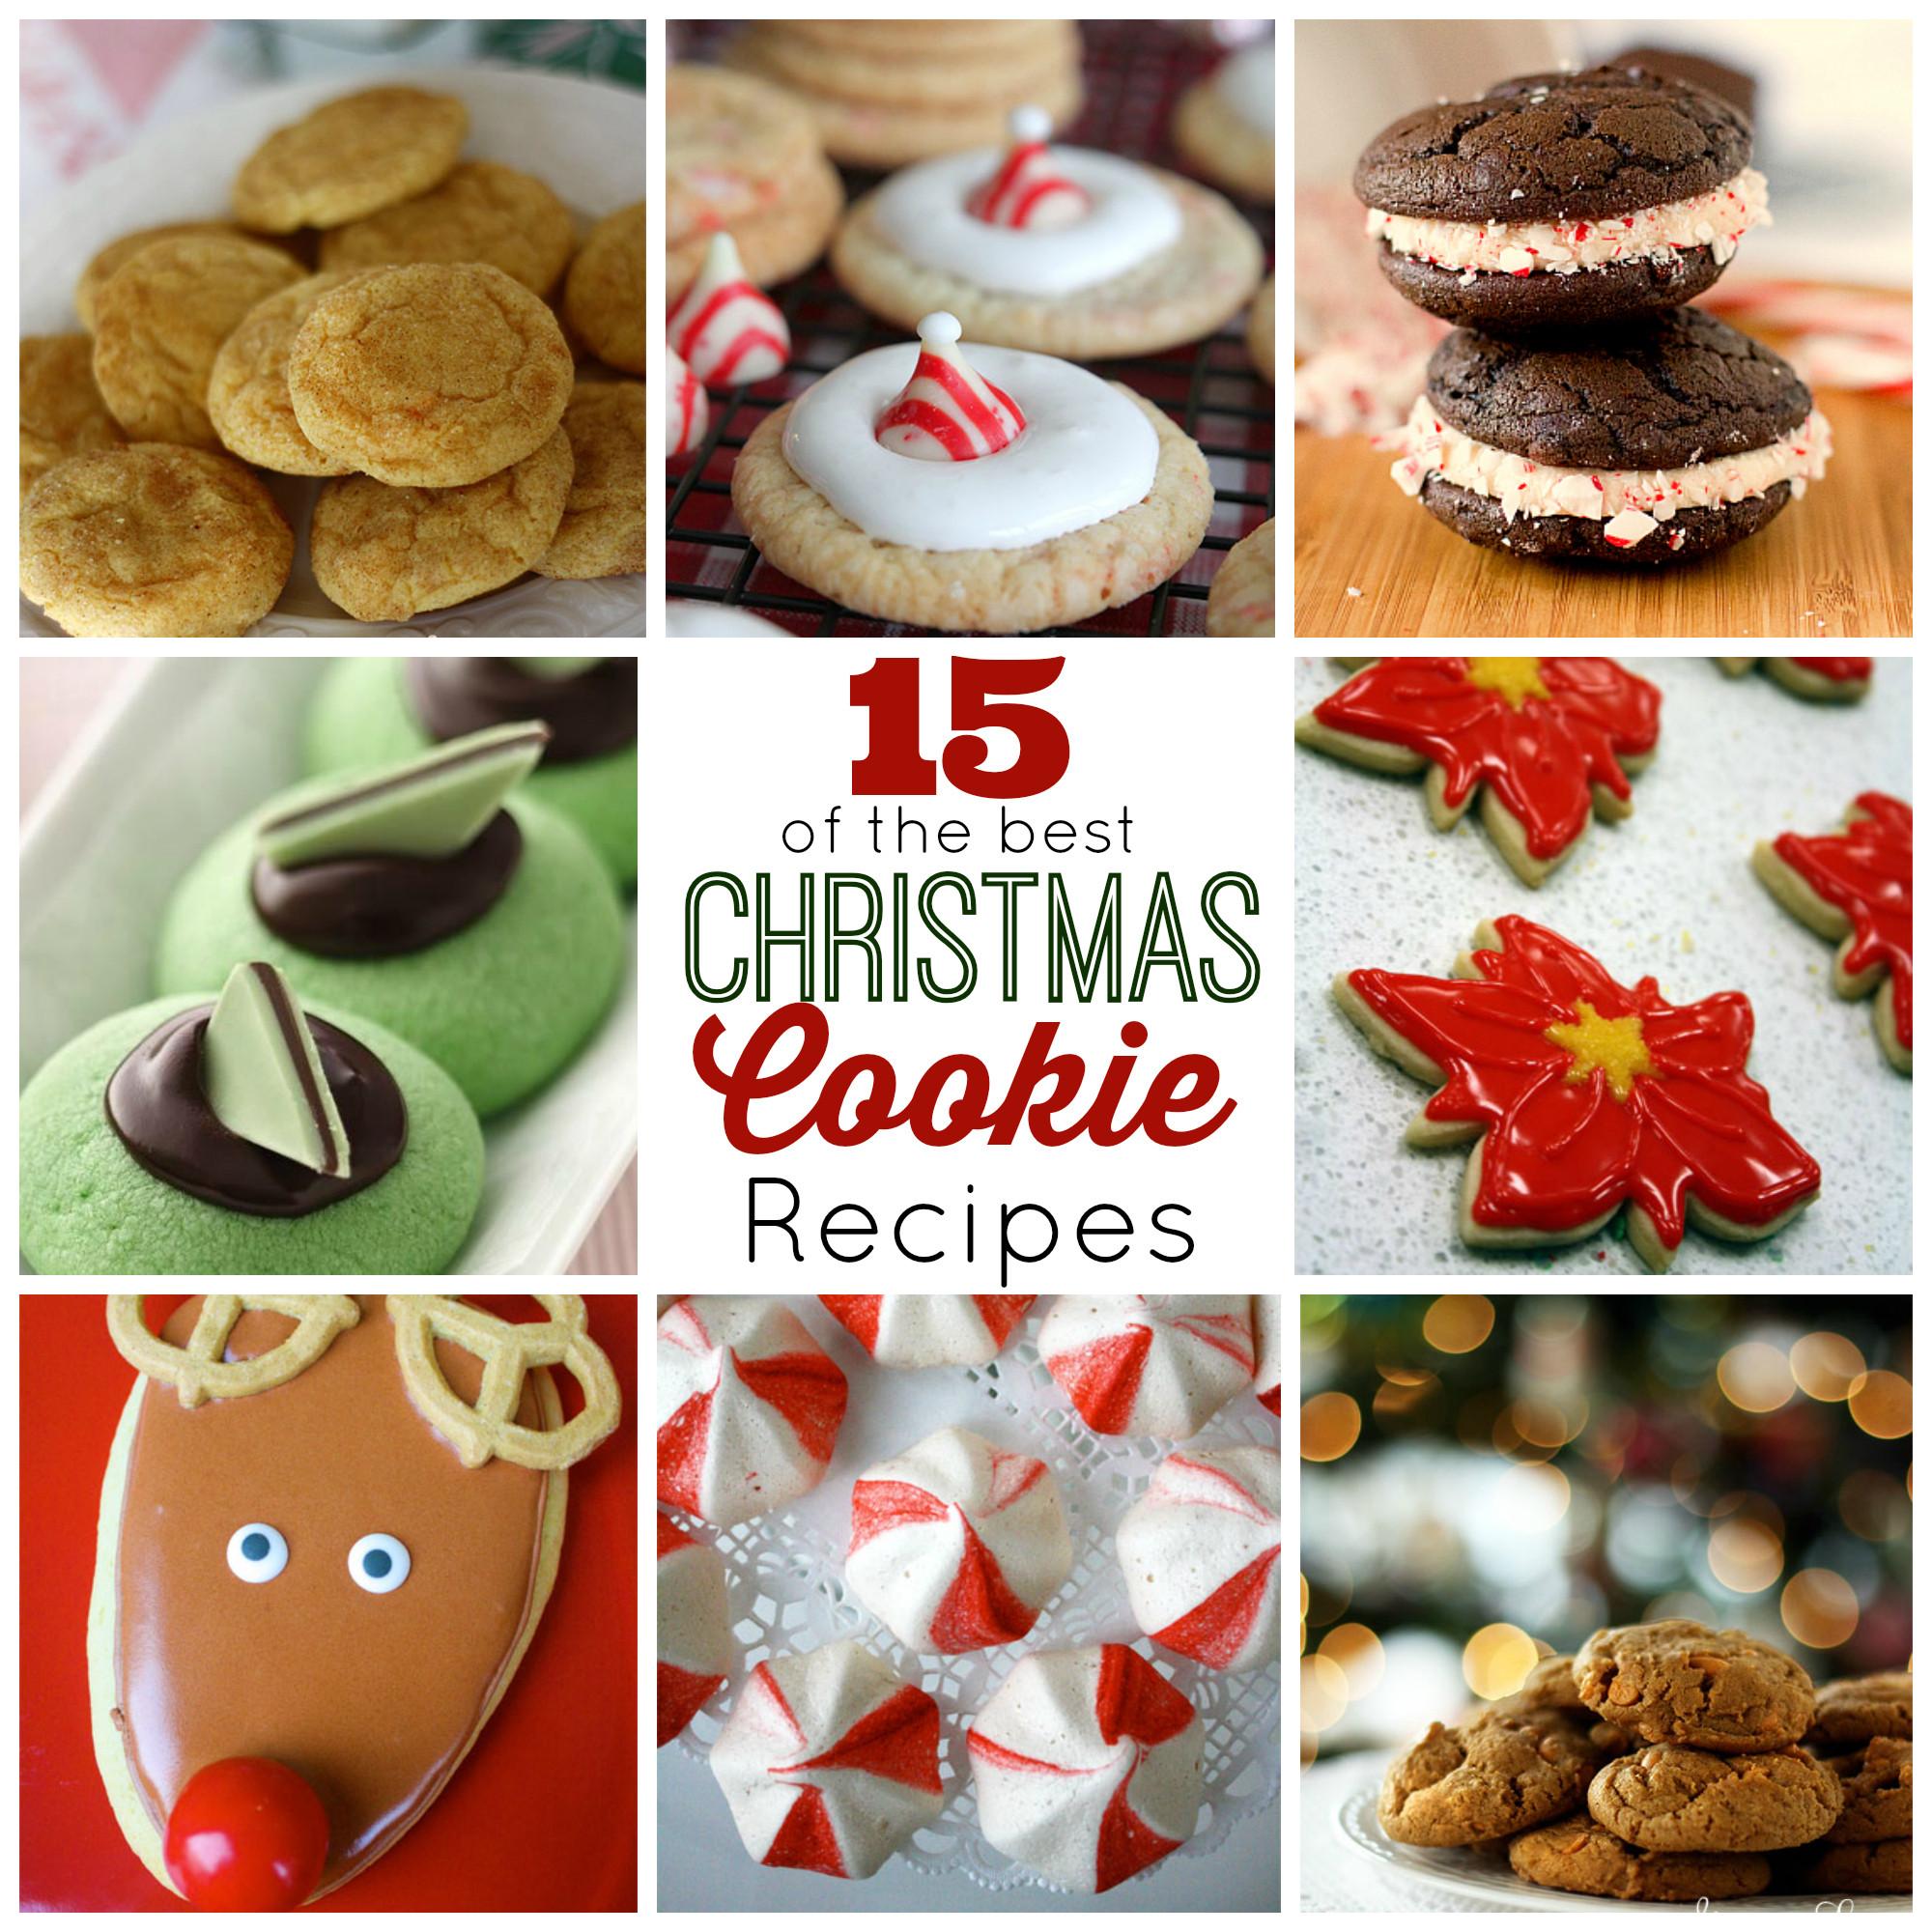 Best Christmas Cookies Recipes  15 of the Best Christmas Cookies